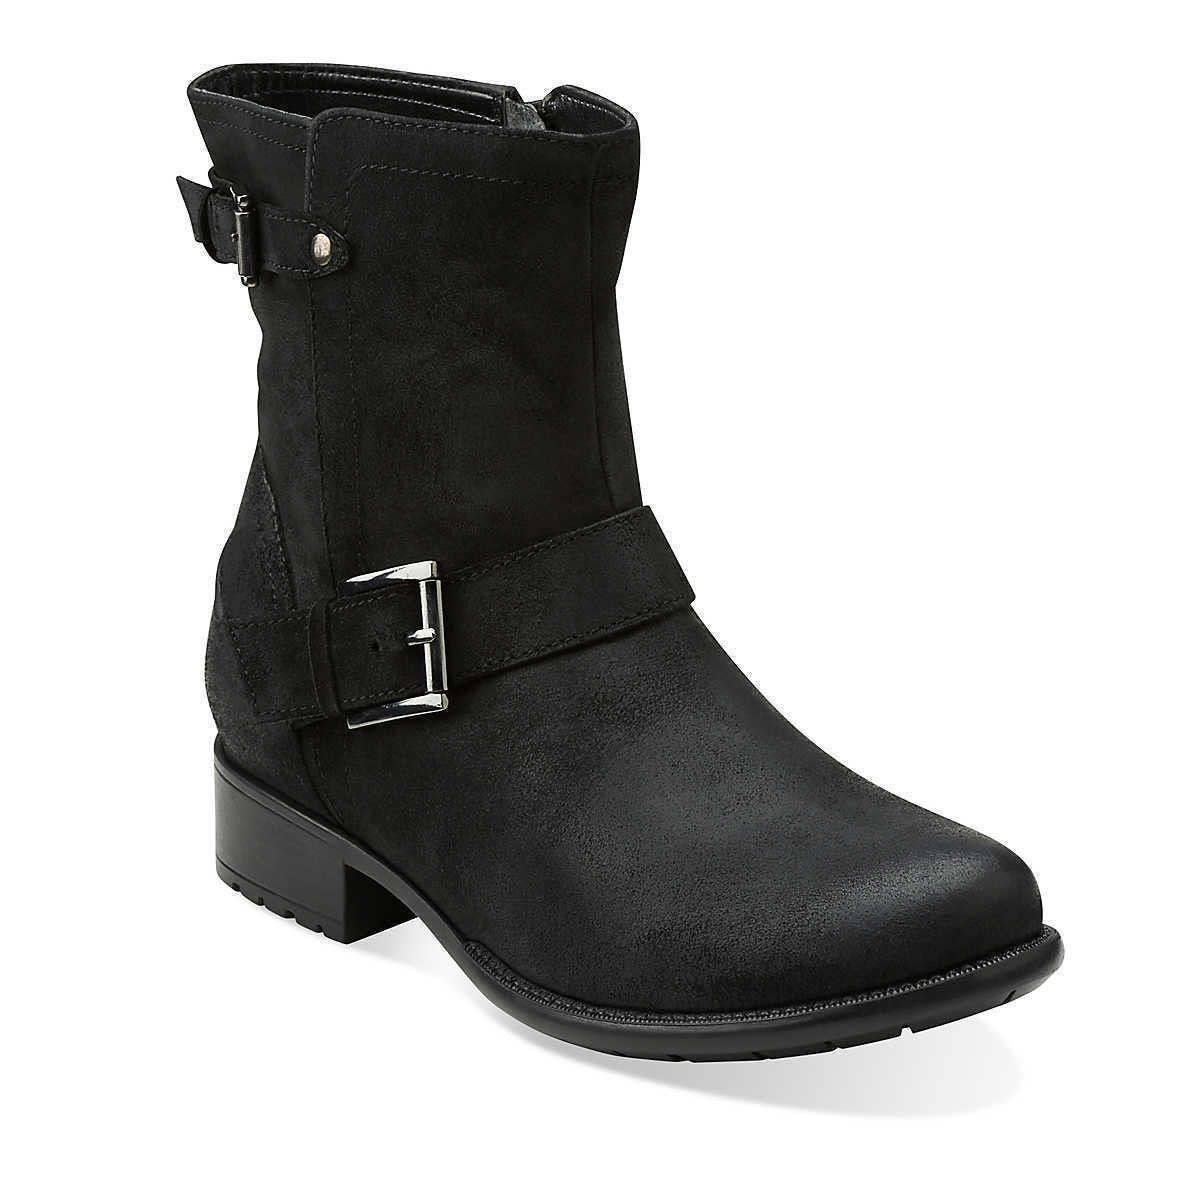 Clarks Black Dames 5 Float Plaza Suede BootGrootte5 PNn0wkX8O